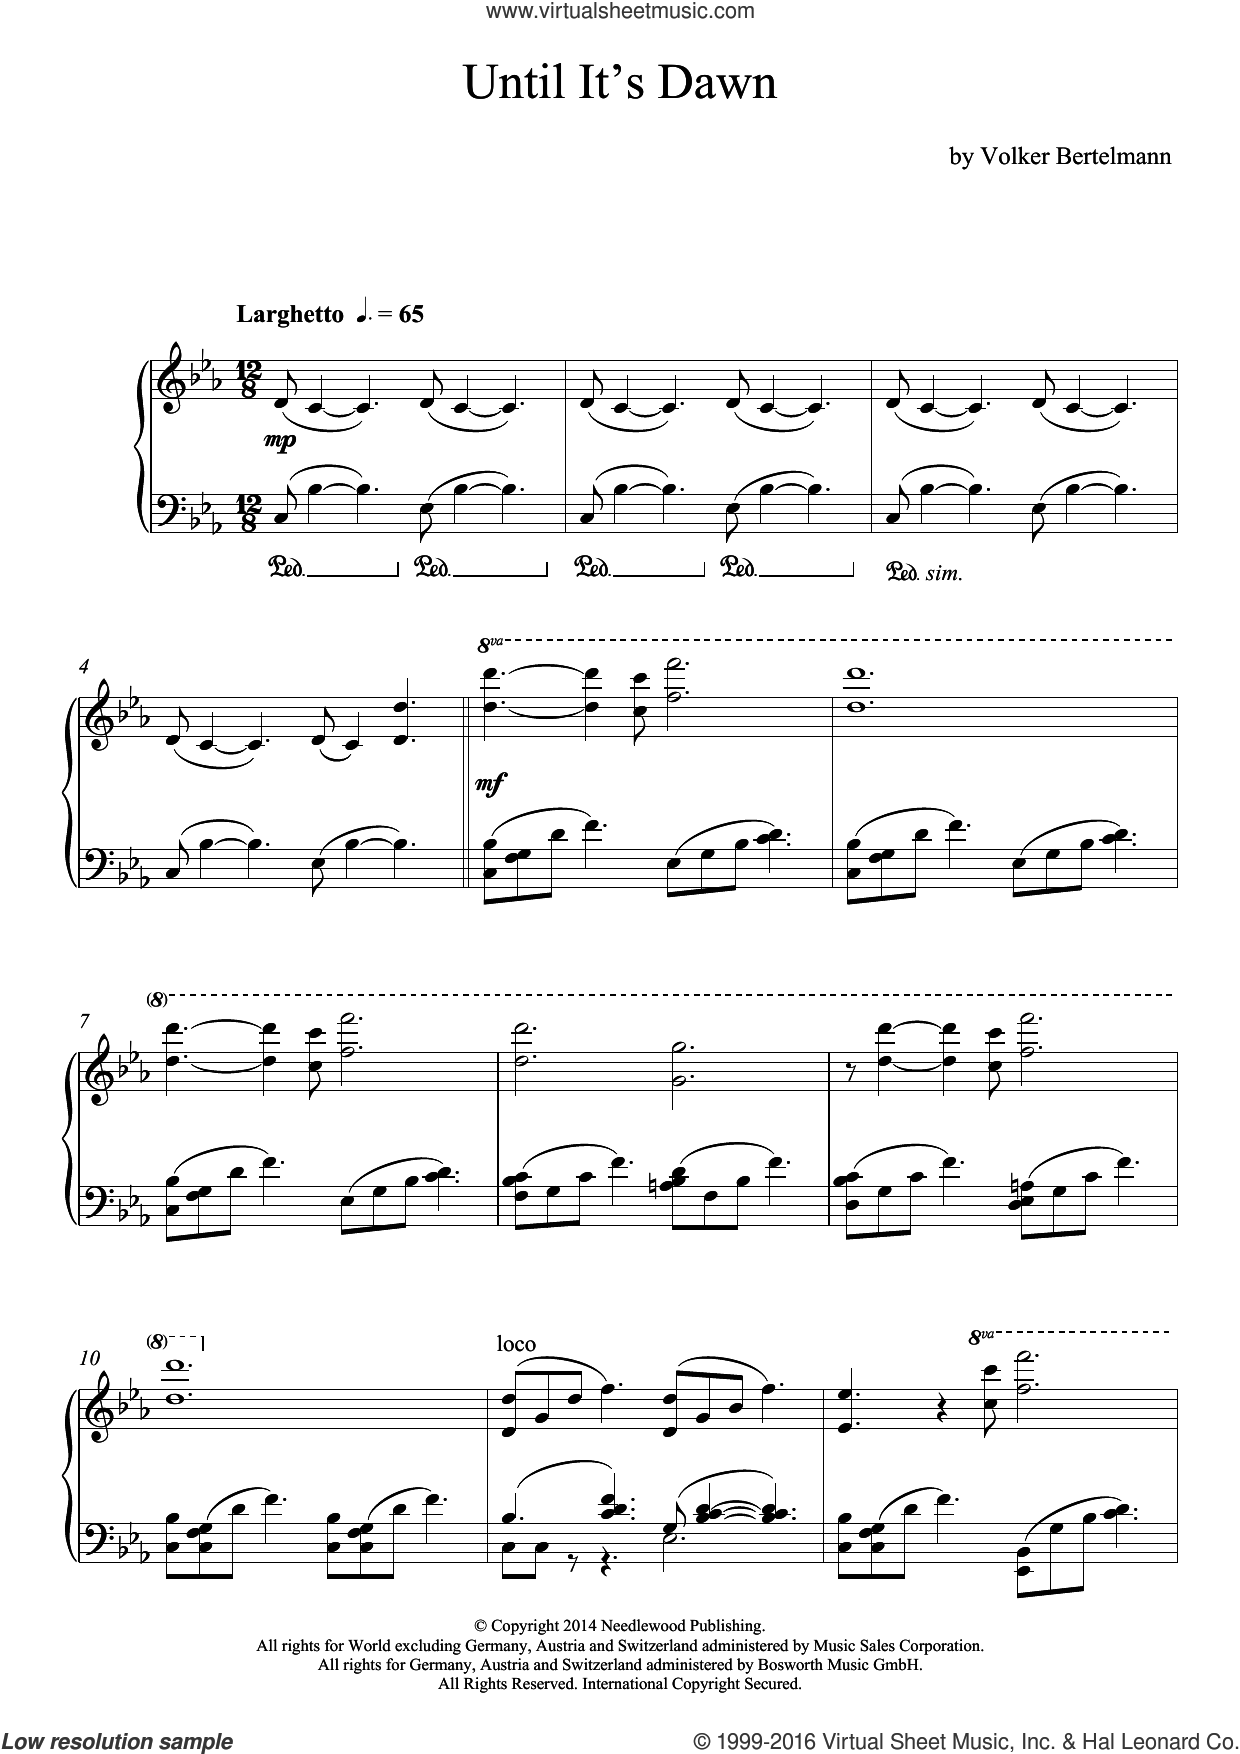 Until It's Dawn sheet music for piano solo by Hauschka and Volker Bertelmann, classical score, intermediate skill level